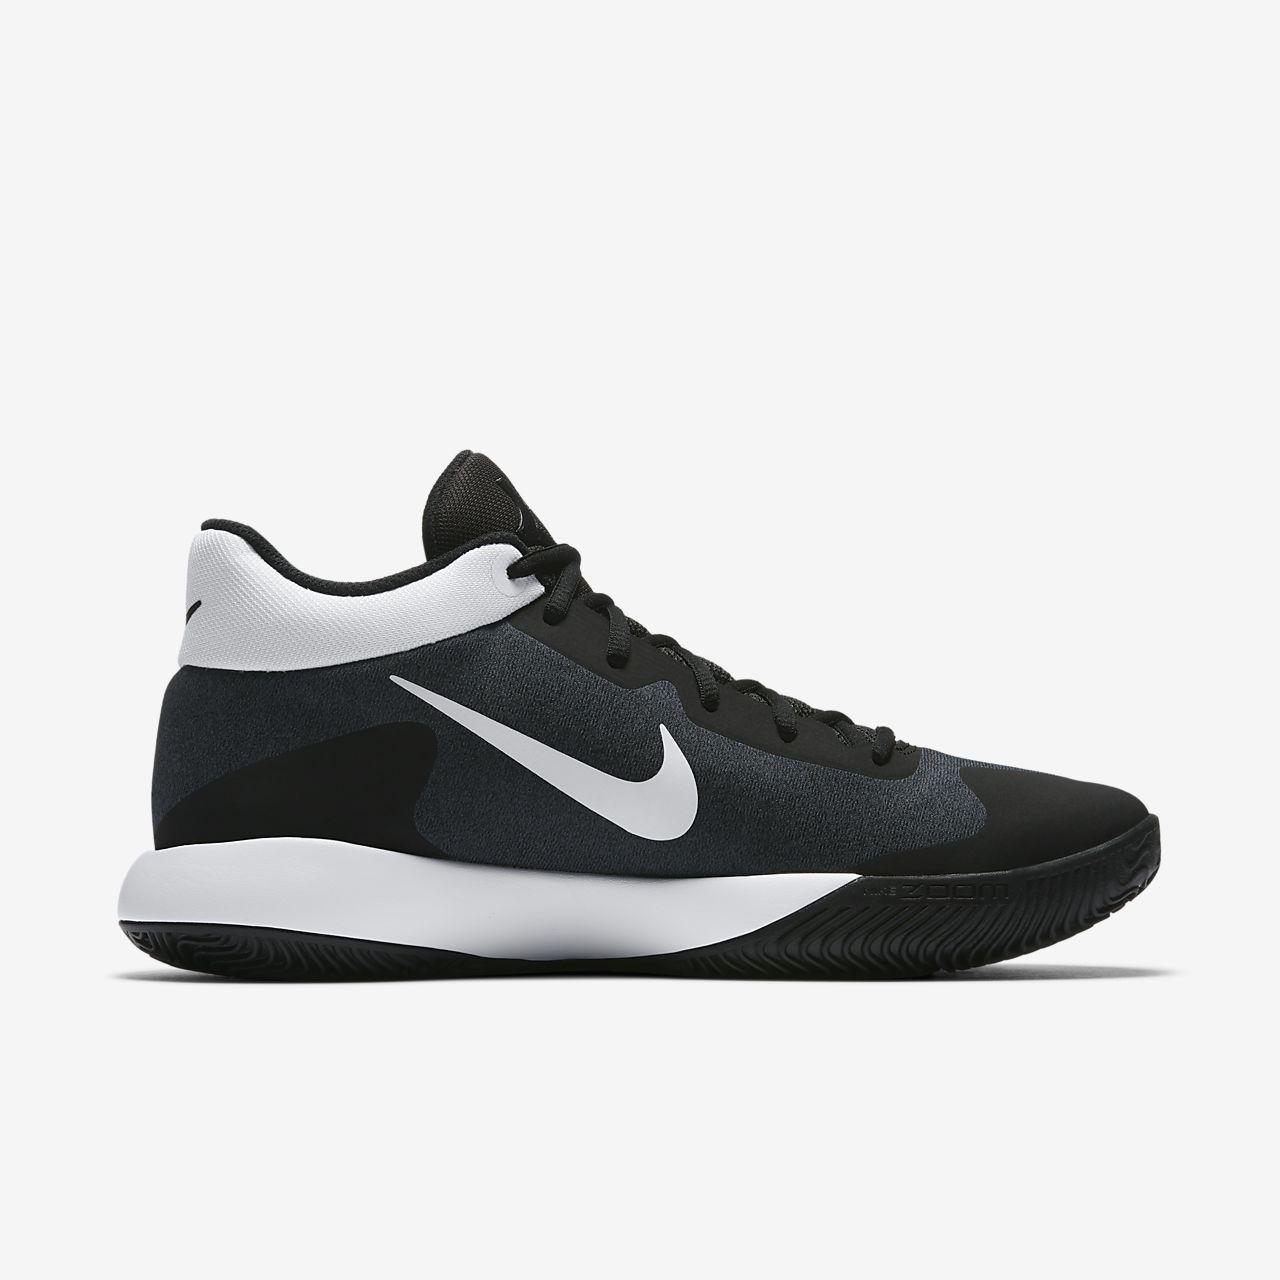 ... KD Trey 5 V Men's Basketball Shoe